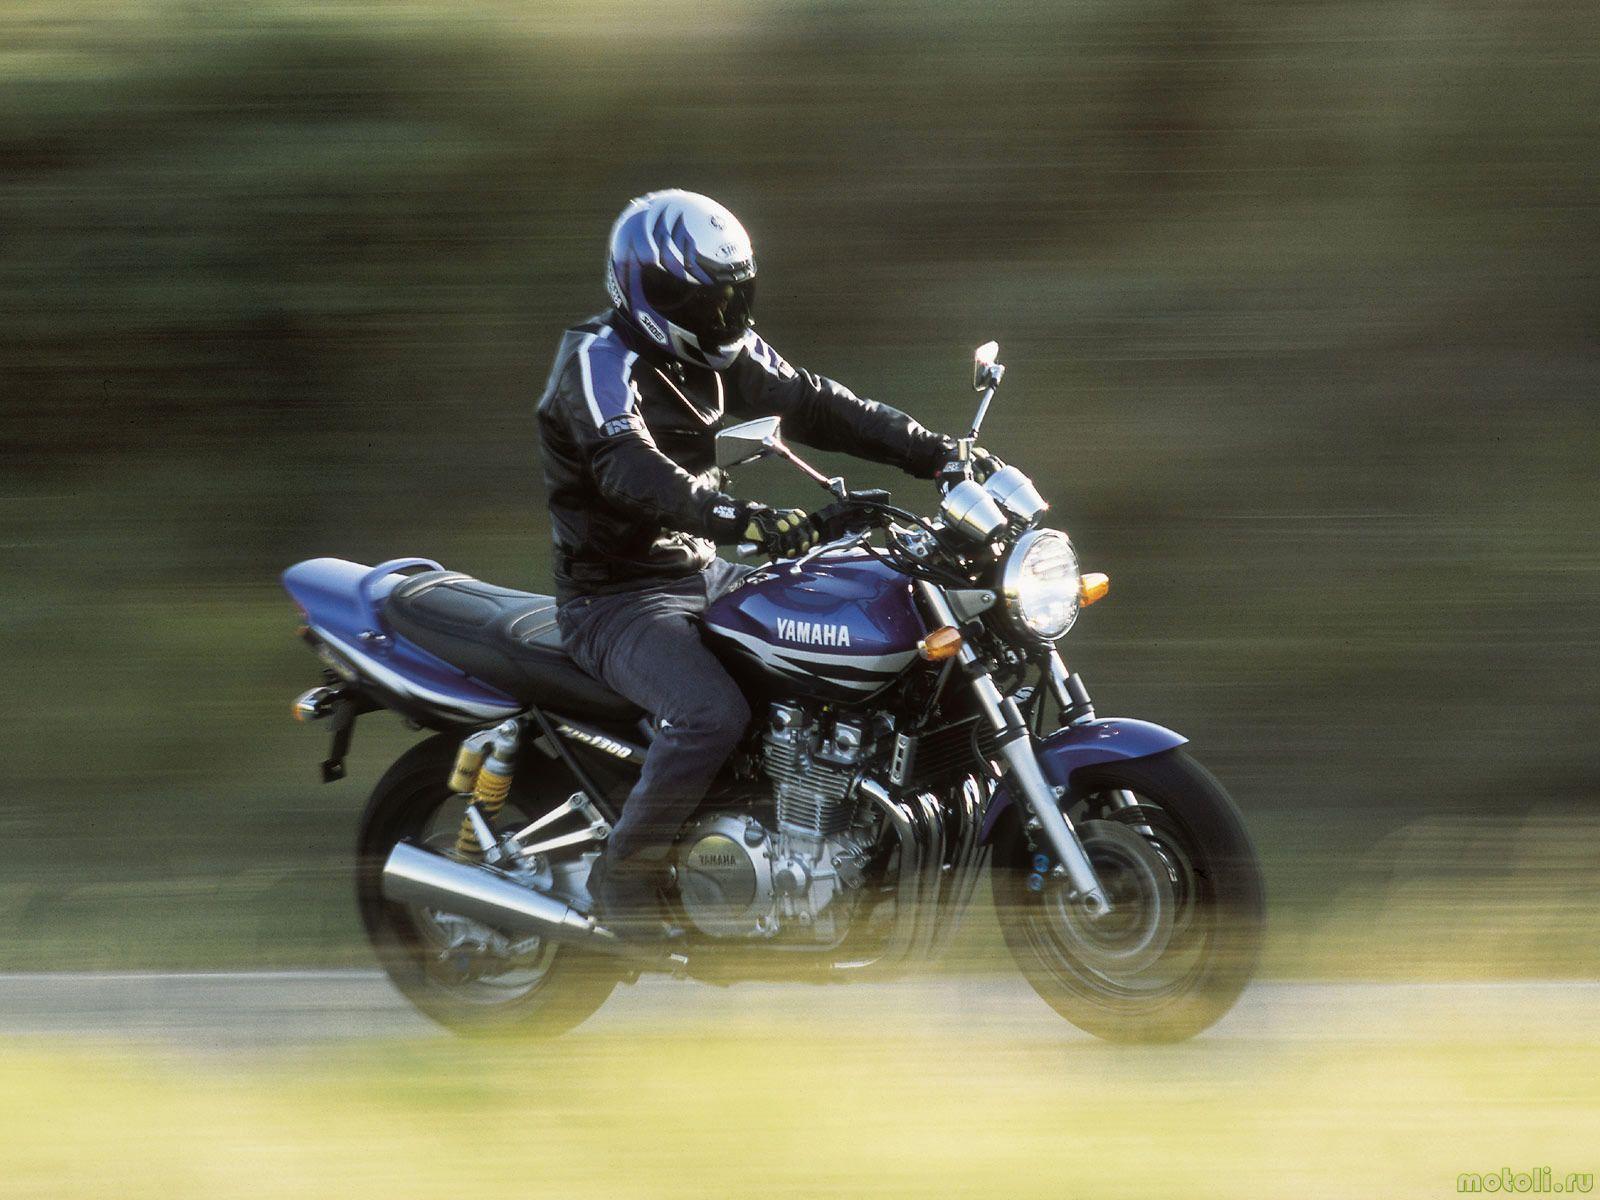 Тест-драйв мотоцикла Yamaha SRX400